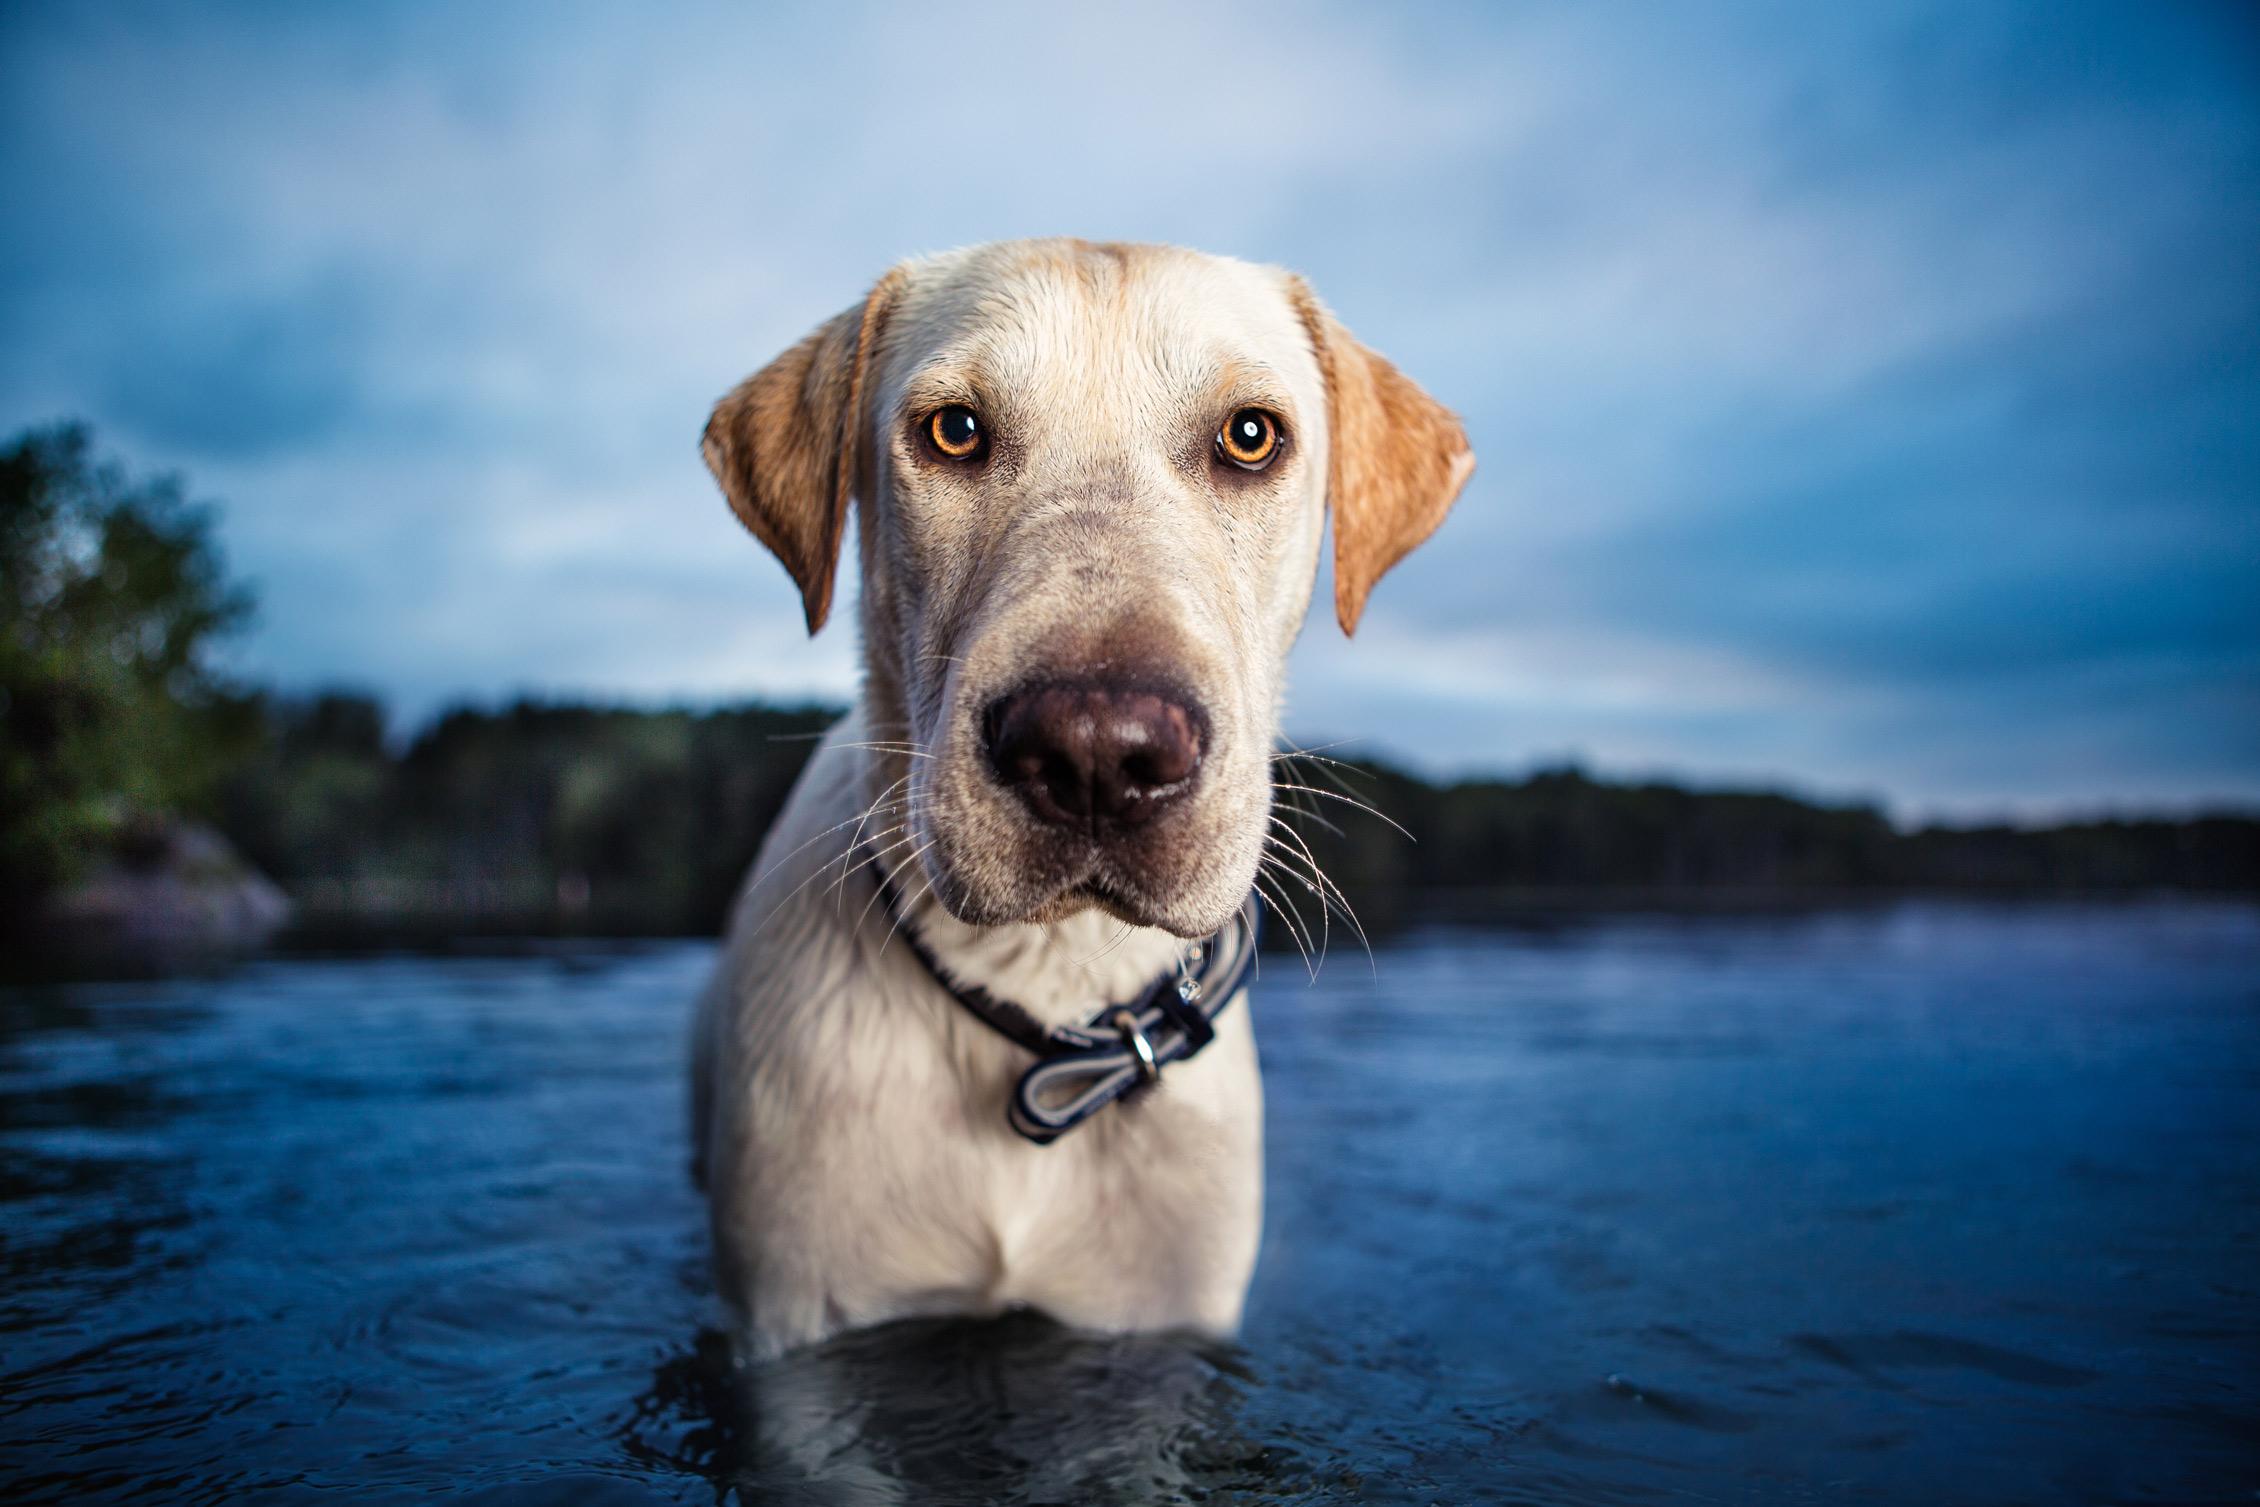 NYC dog photography by Leslie Leda